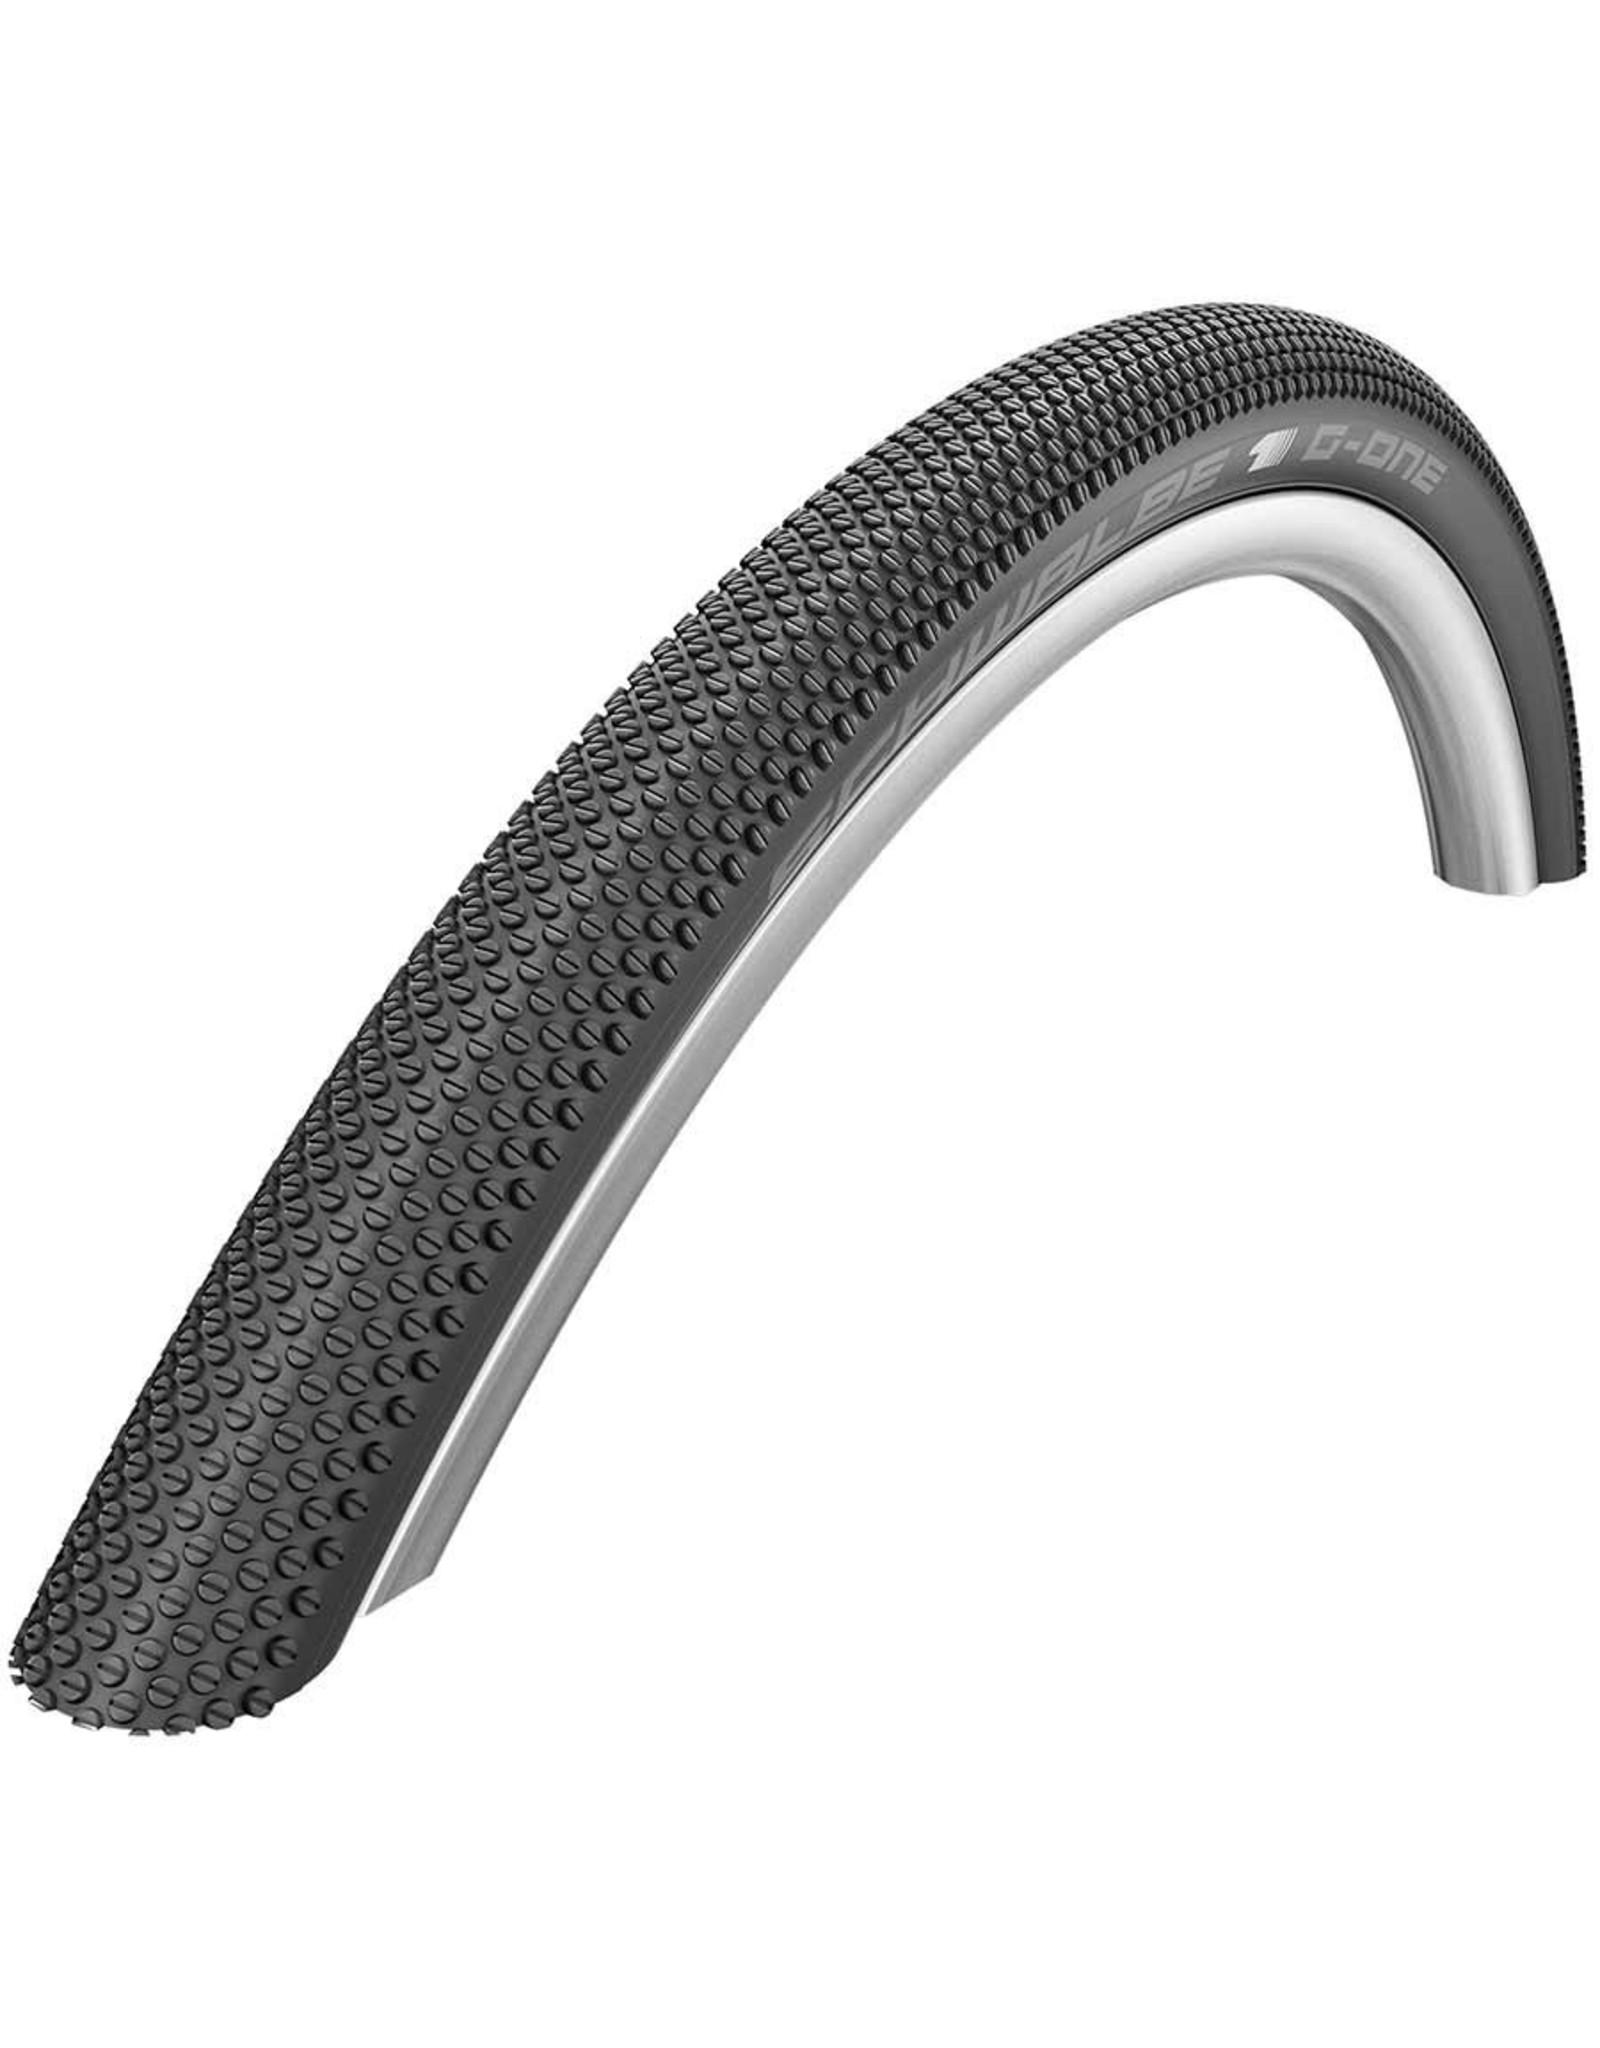 SCHWALBE Schwalbe, G-One Allround, Tire, 27.5''x1.50, Folding, Clincher, Dual, RaceGuard, 67, Black